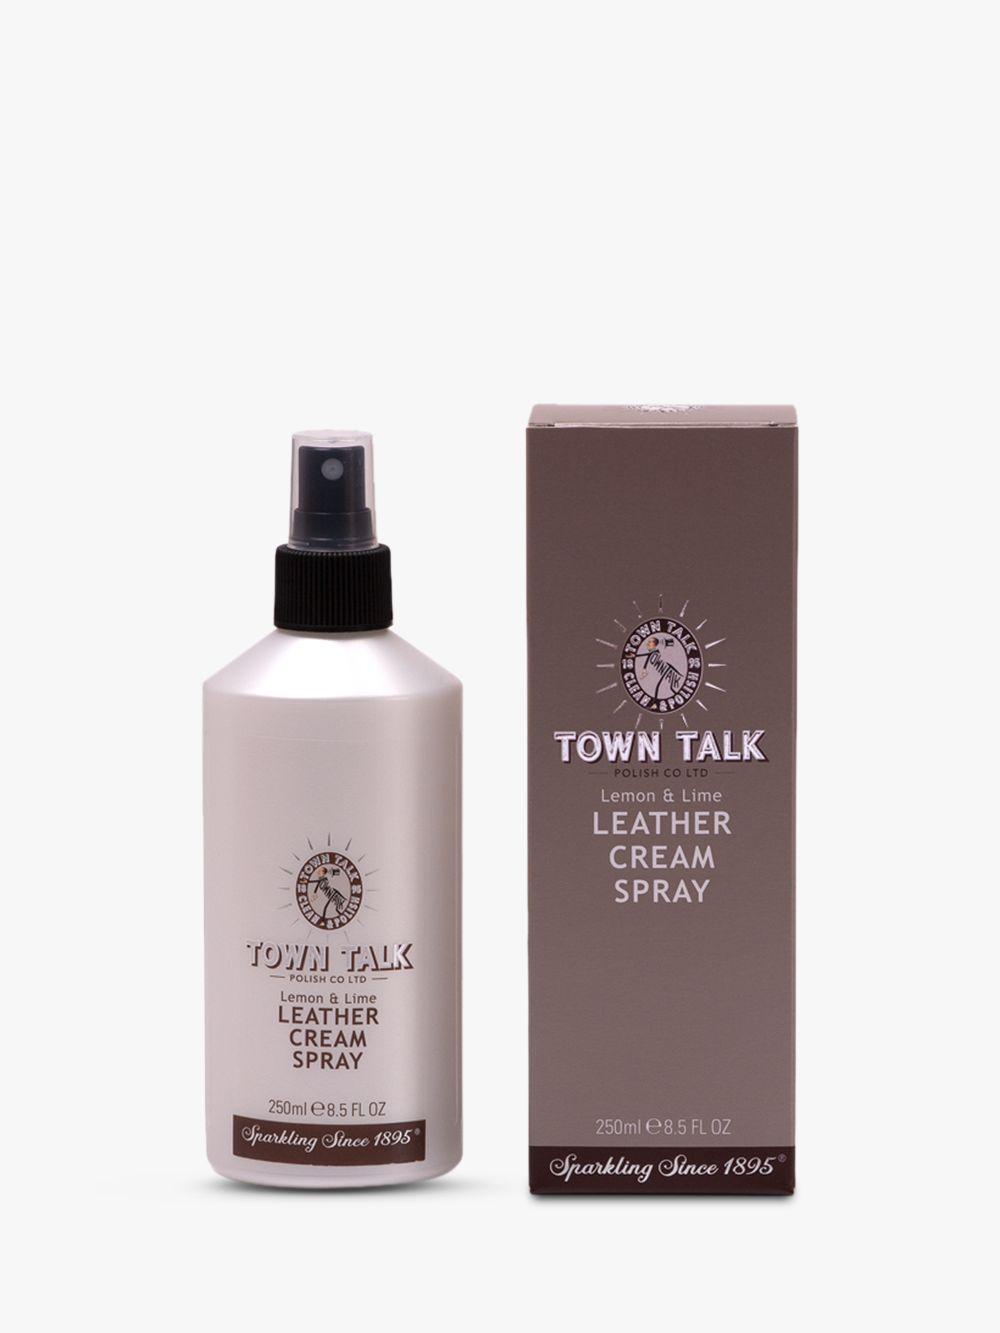 Town Talk Town Talk Lemon & Lime Leather Cream Spray, 250ml